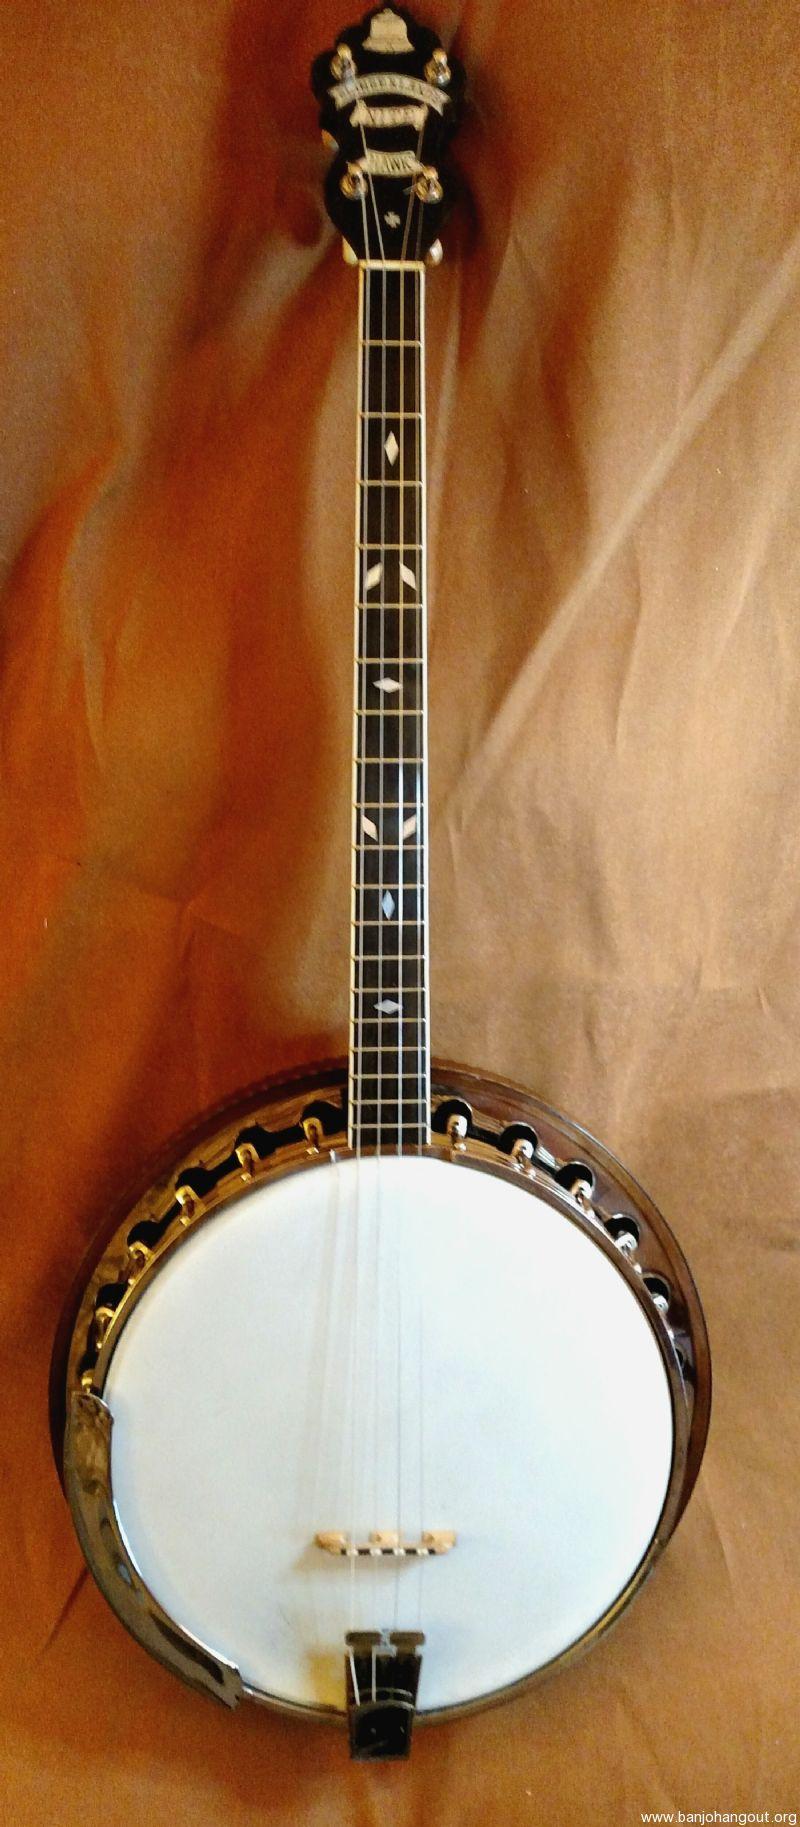 slingerland nite hawk 19 fret tenor banjo